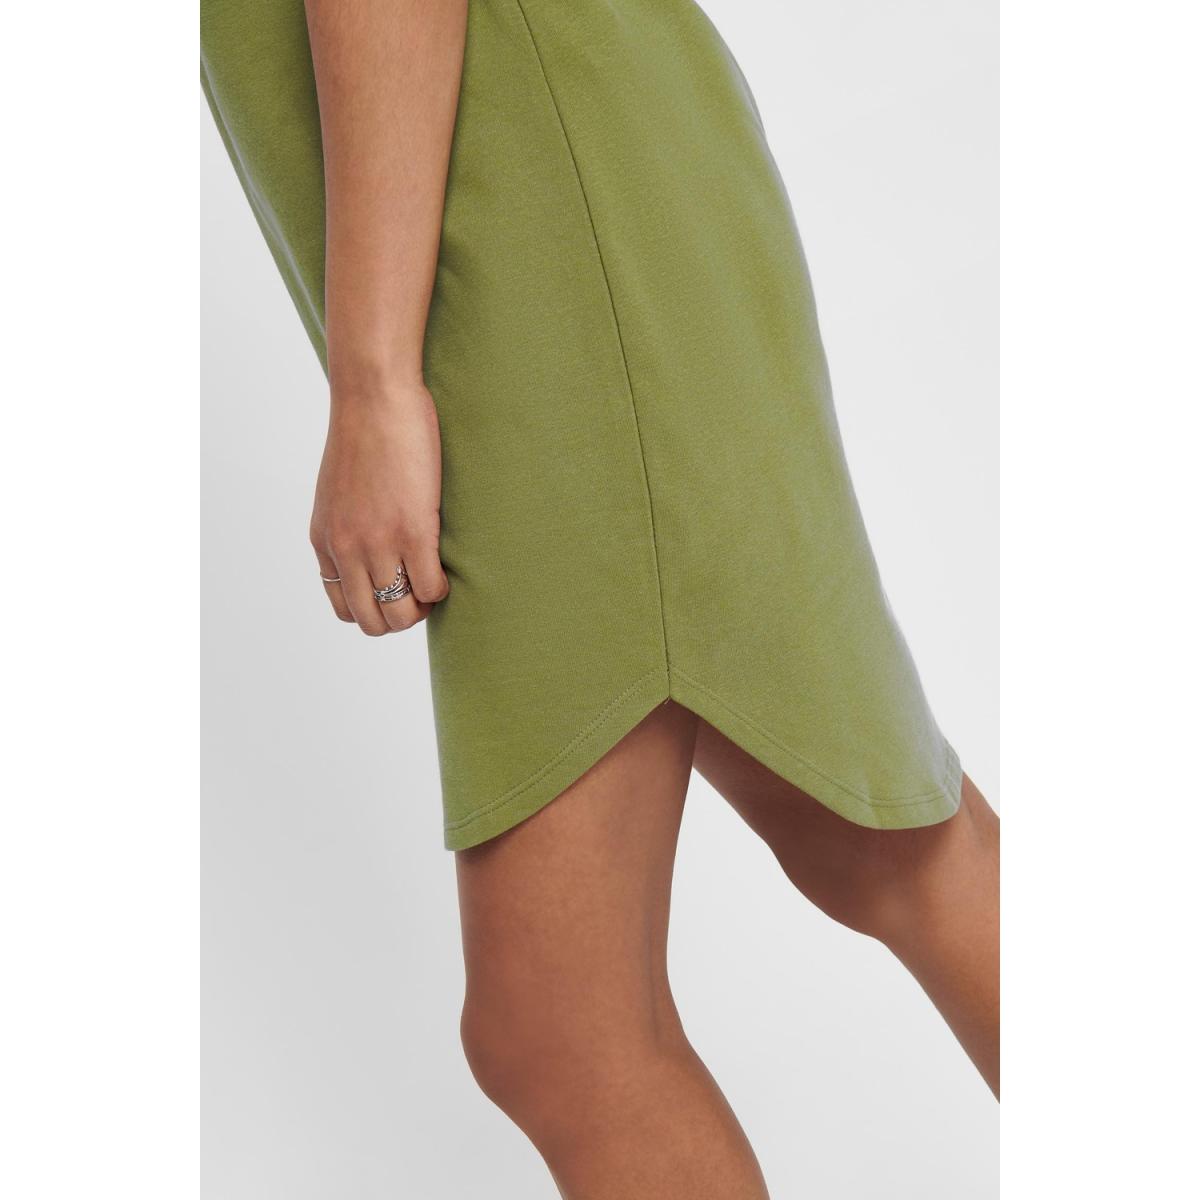 jdyivy life s/s dress jrs noos 15174793 jacqueline de yong jurk martini olive